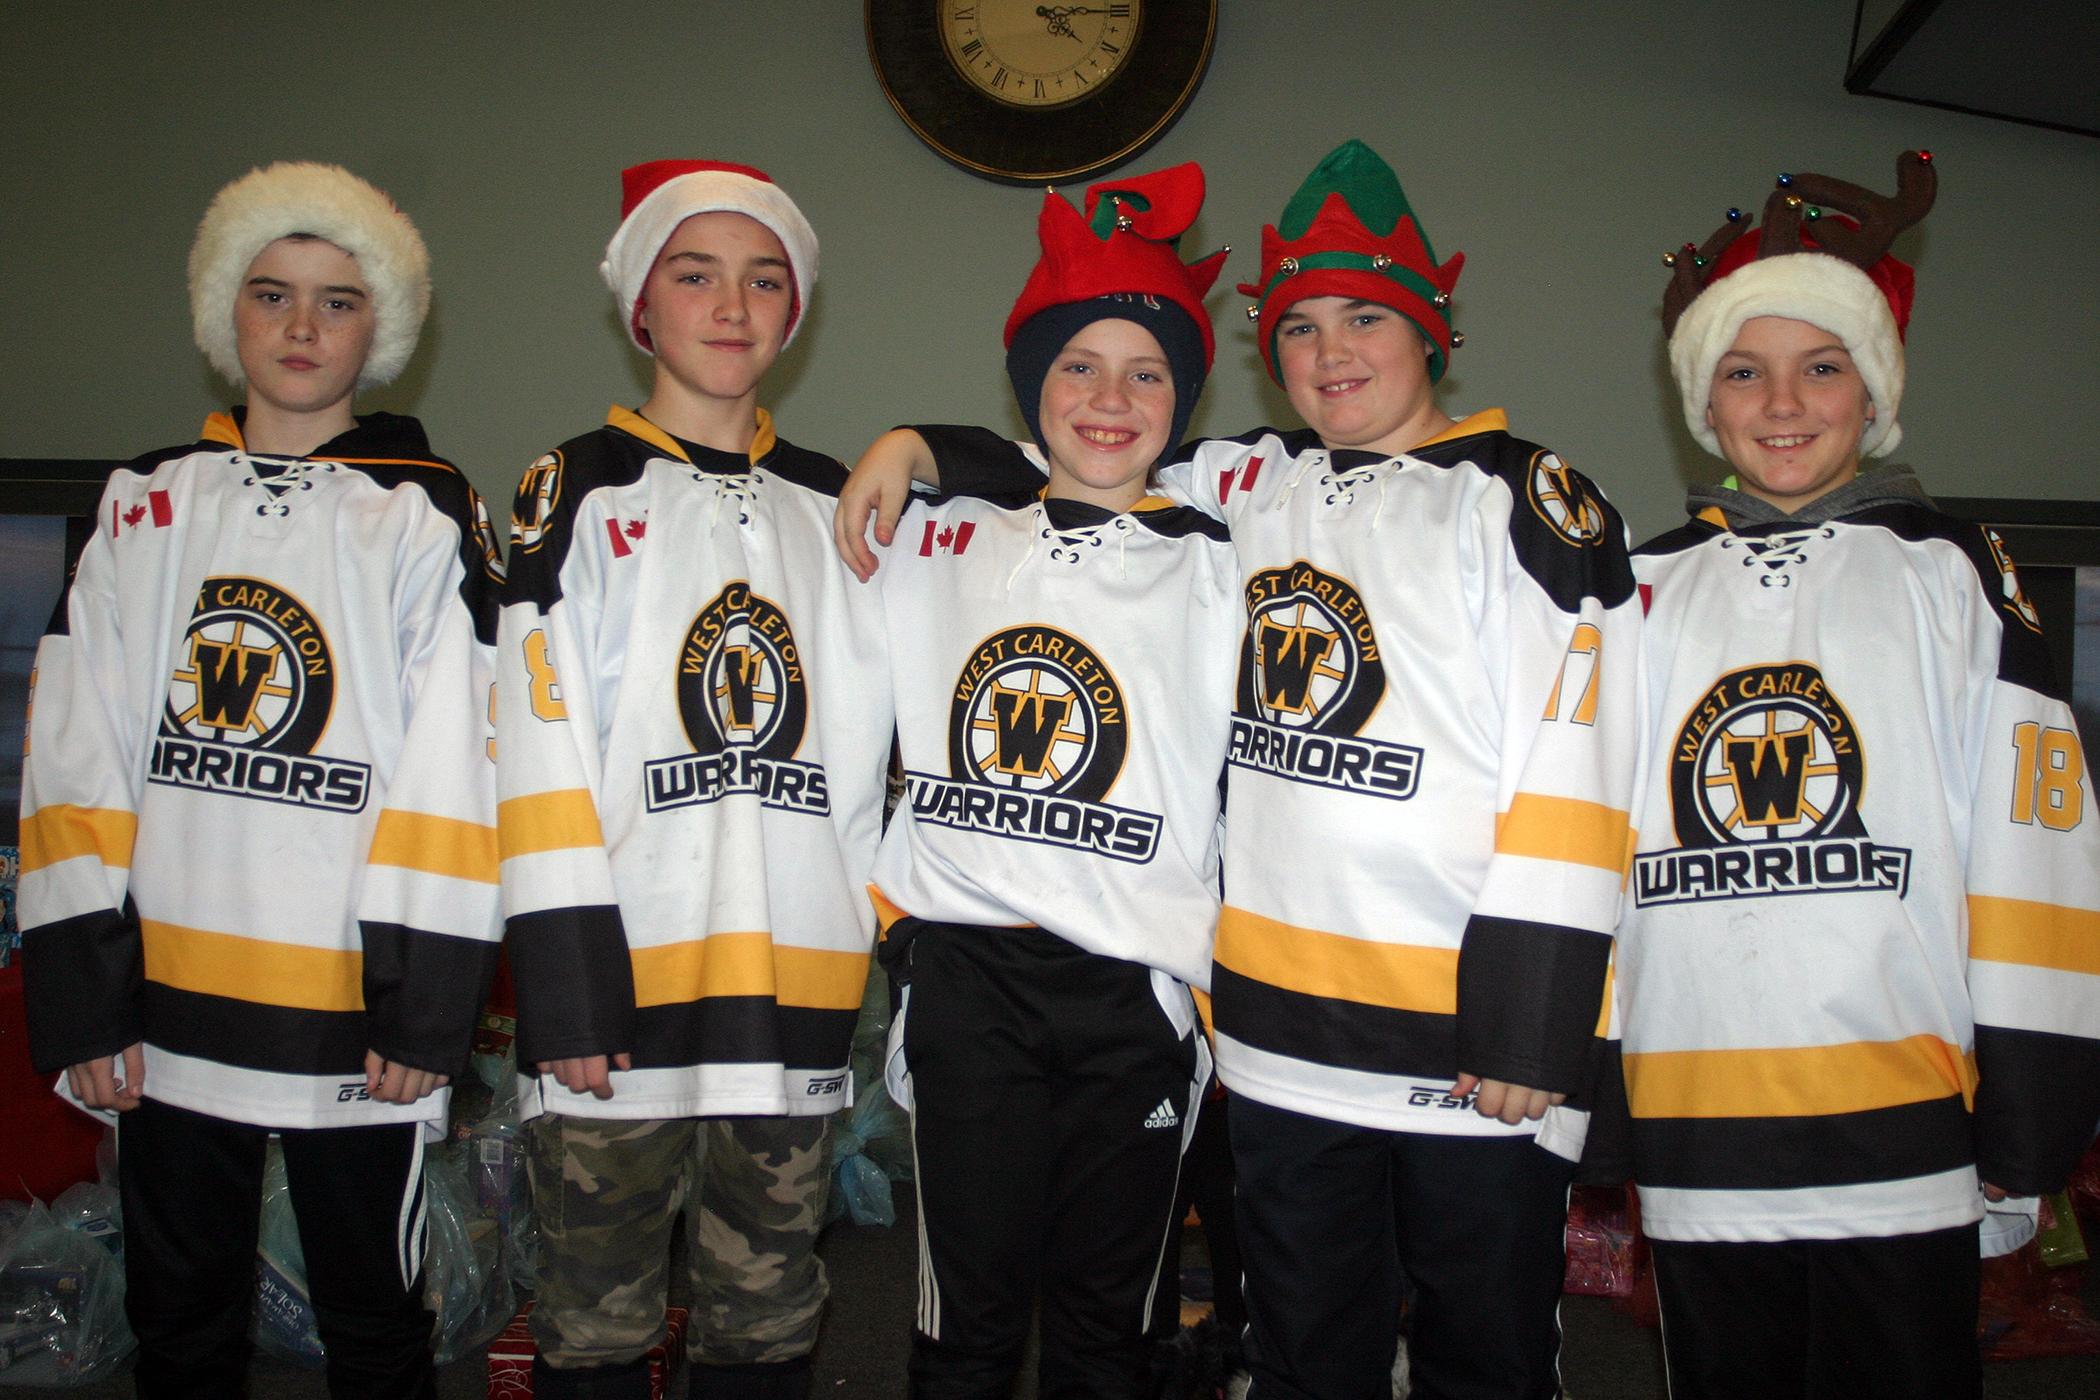 The West Carleton Warriors Pee Wee A team volunteered their time as Santa's elves. Photo by Jake Davies